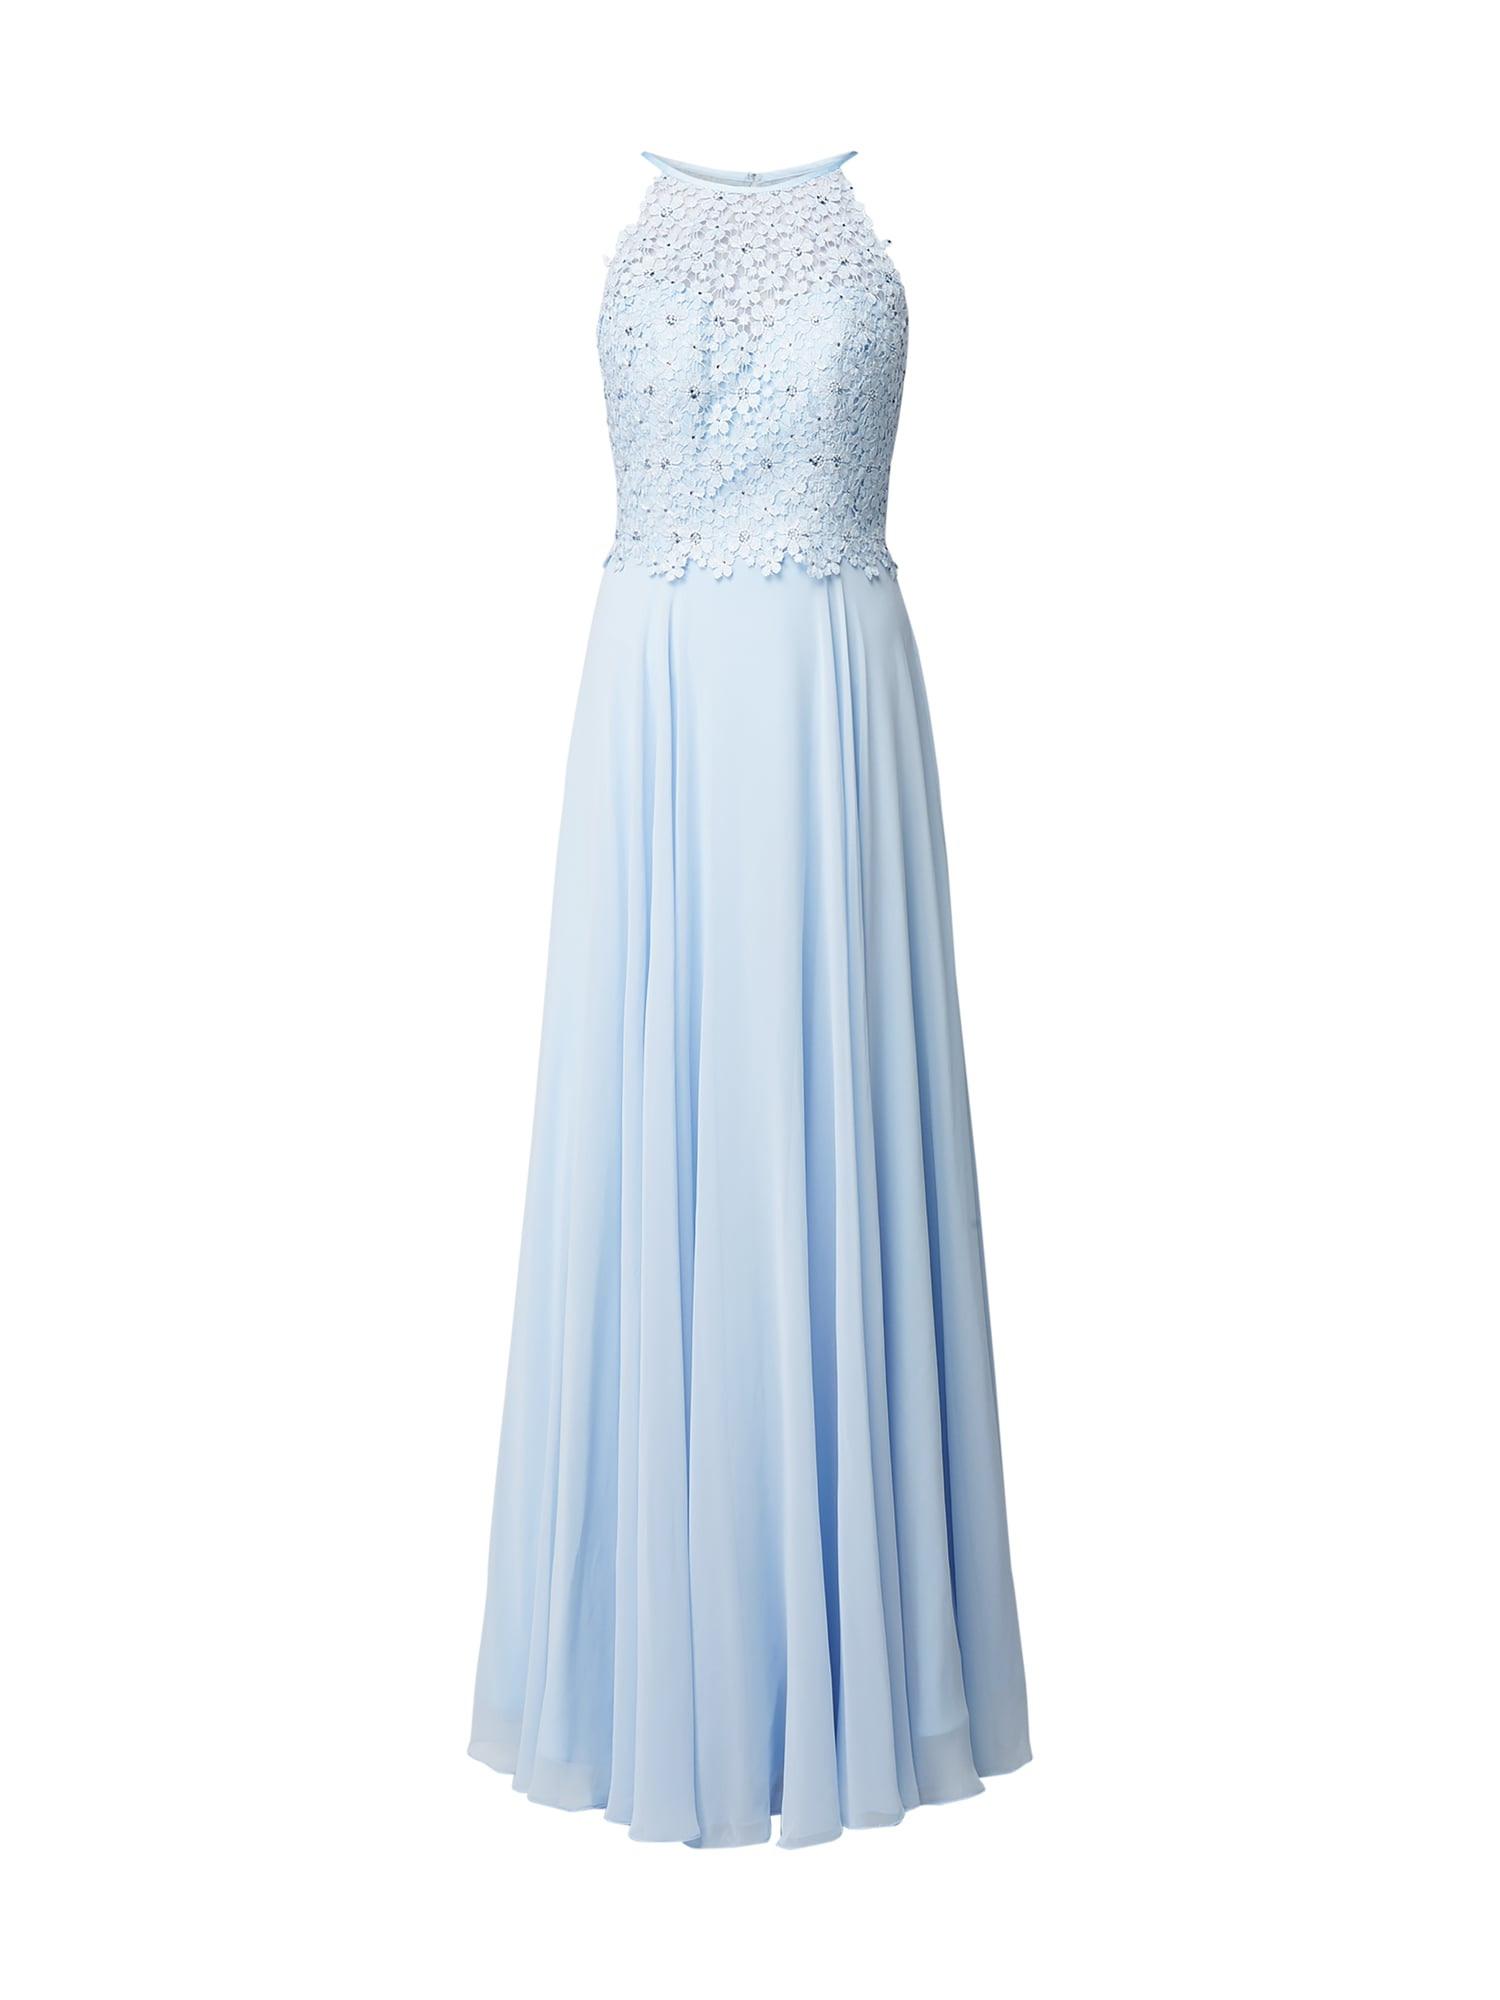 Designer Einfach Abendkleid Hellblau Galerie15 Top Abendkleid Hellblau Stylish